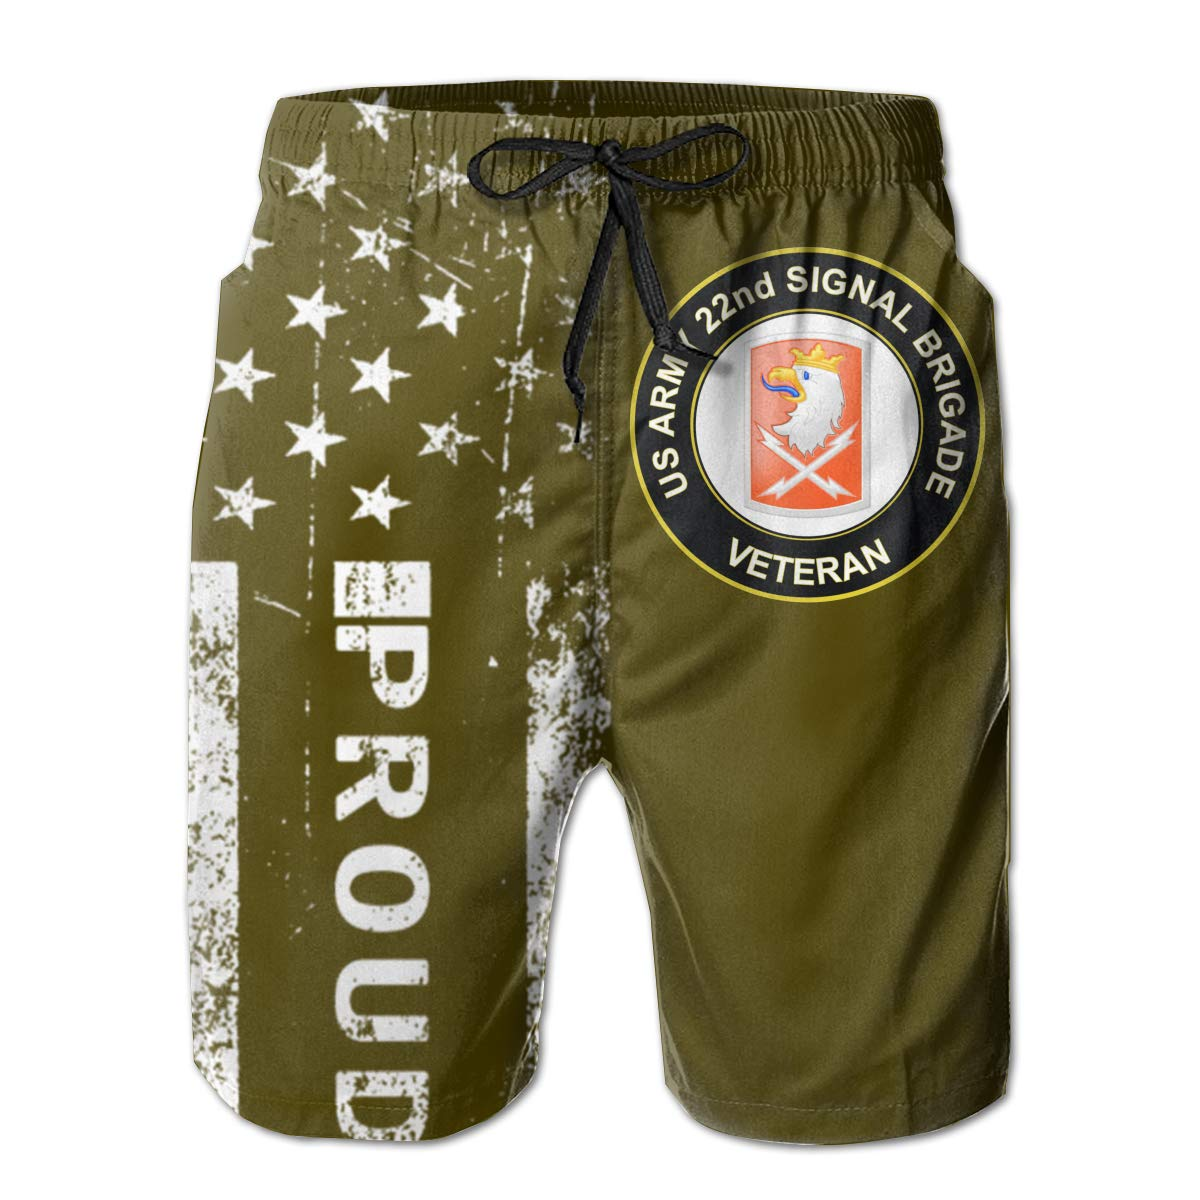 US Army 22nd Signal Brigade Veteran Mens Boardshorts Swim Trunks Beach Athletic Shorts